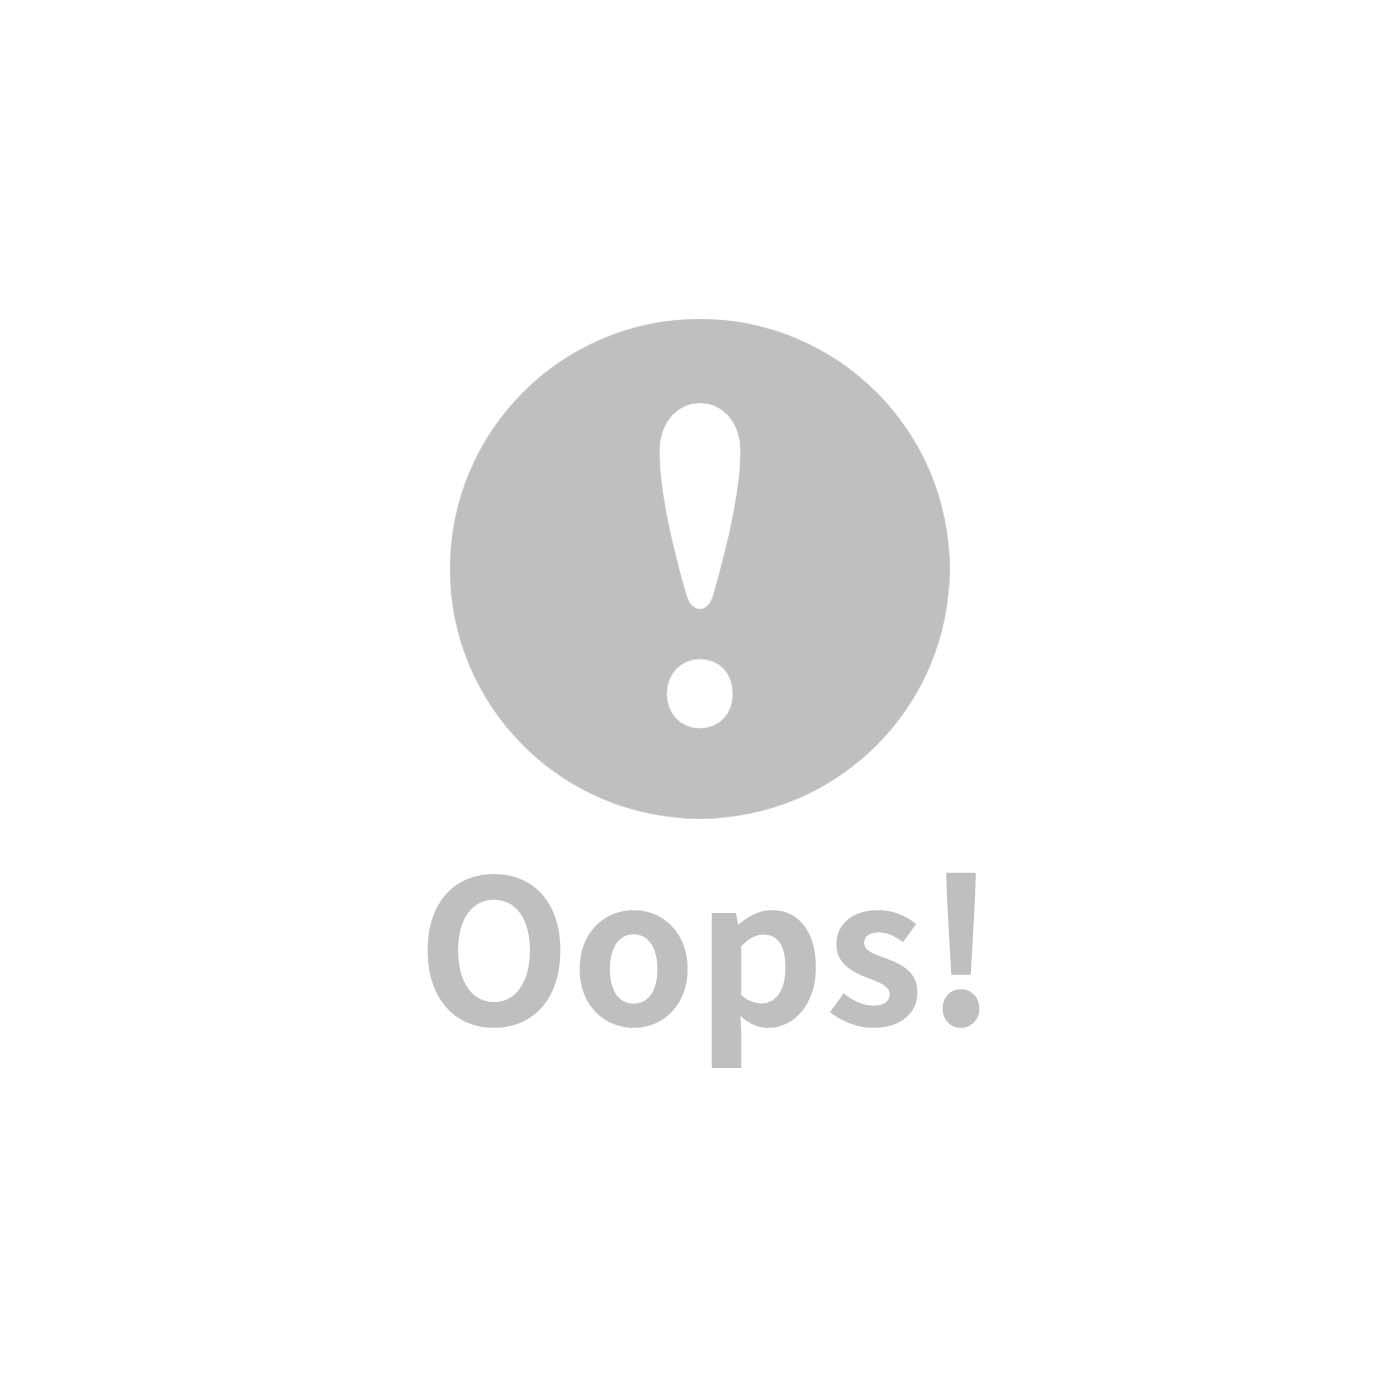 global affairs 童話手工編織安撫玩偶(27cm)-松鼠珊迪